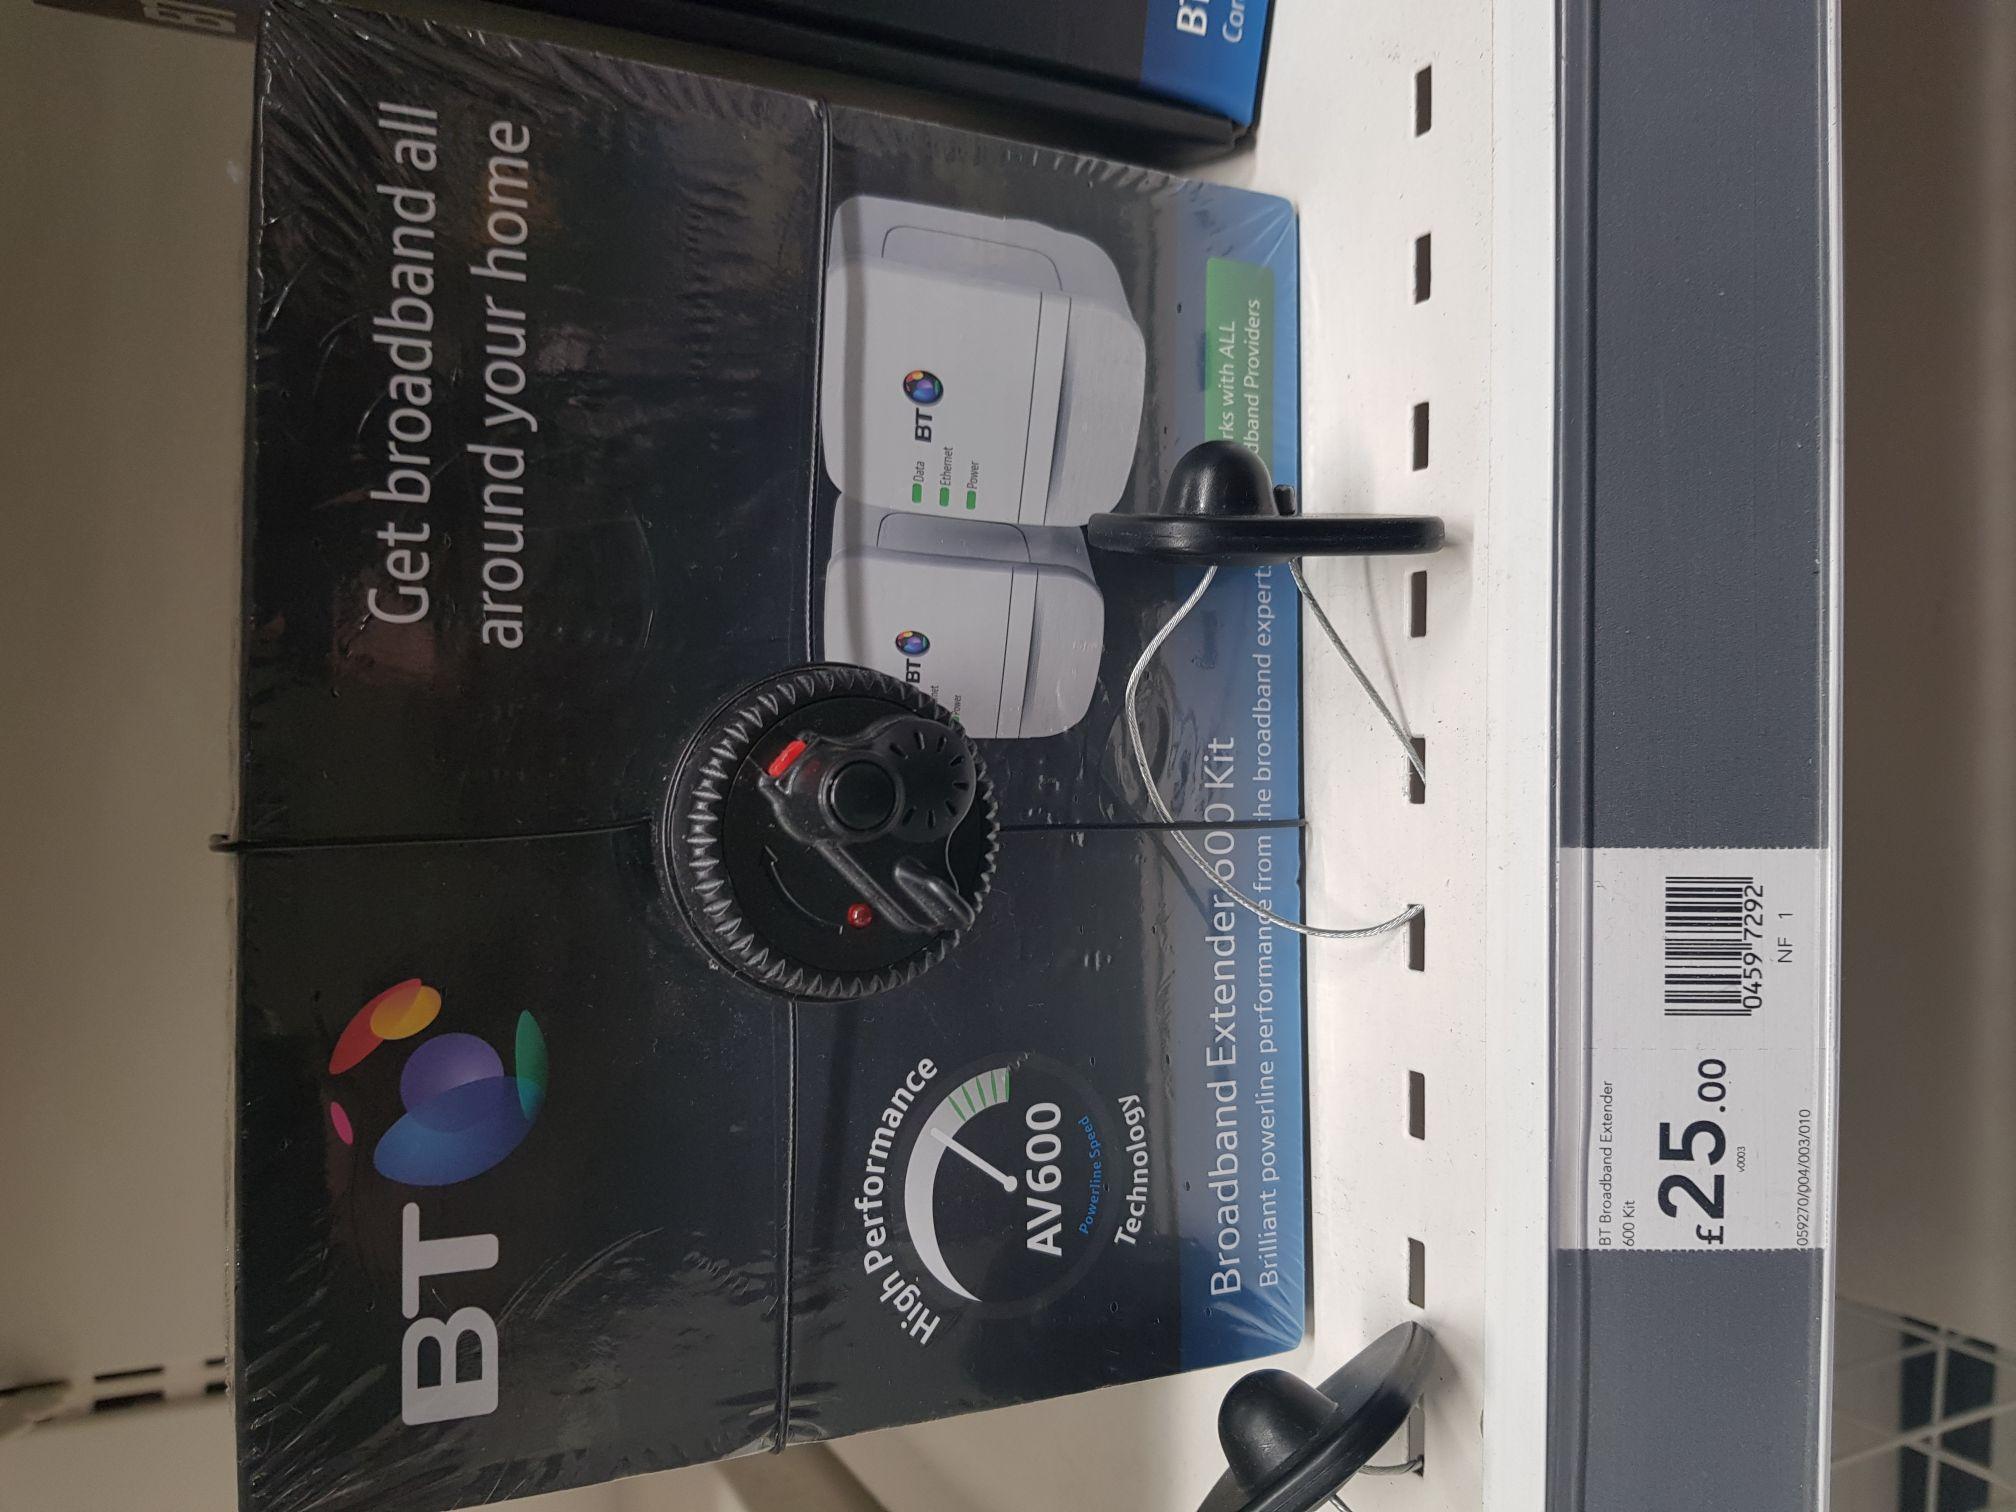 BT broadband extender 600 Kit. At Wilko Eastham London - £25